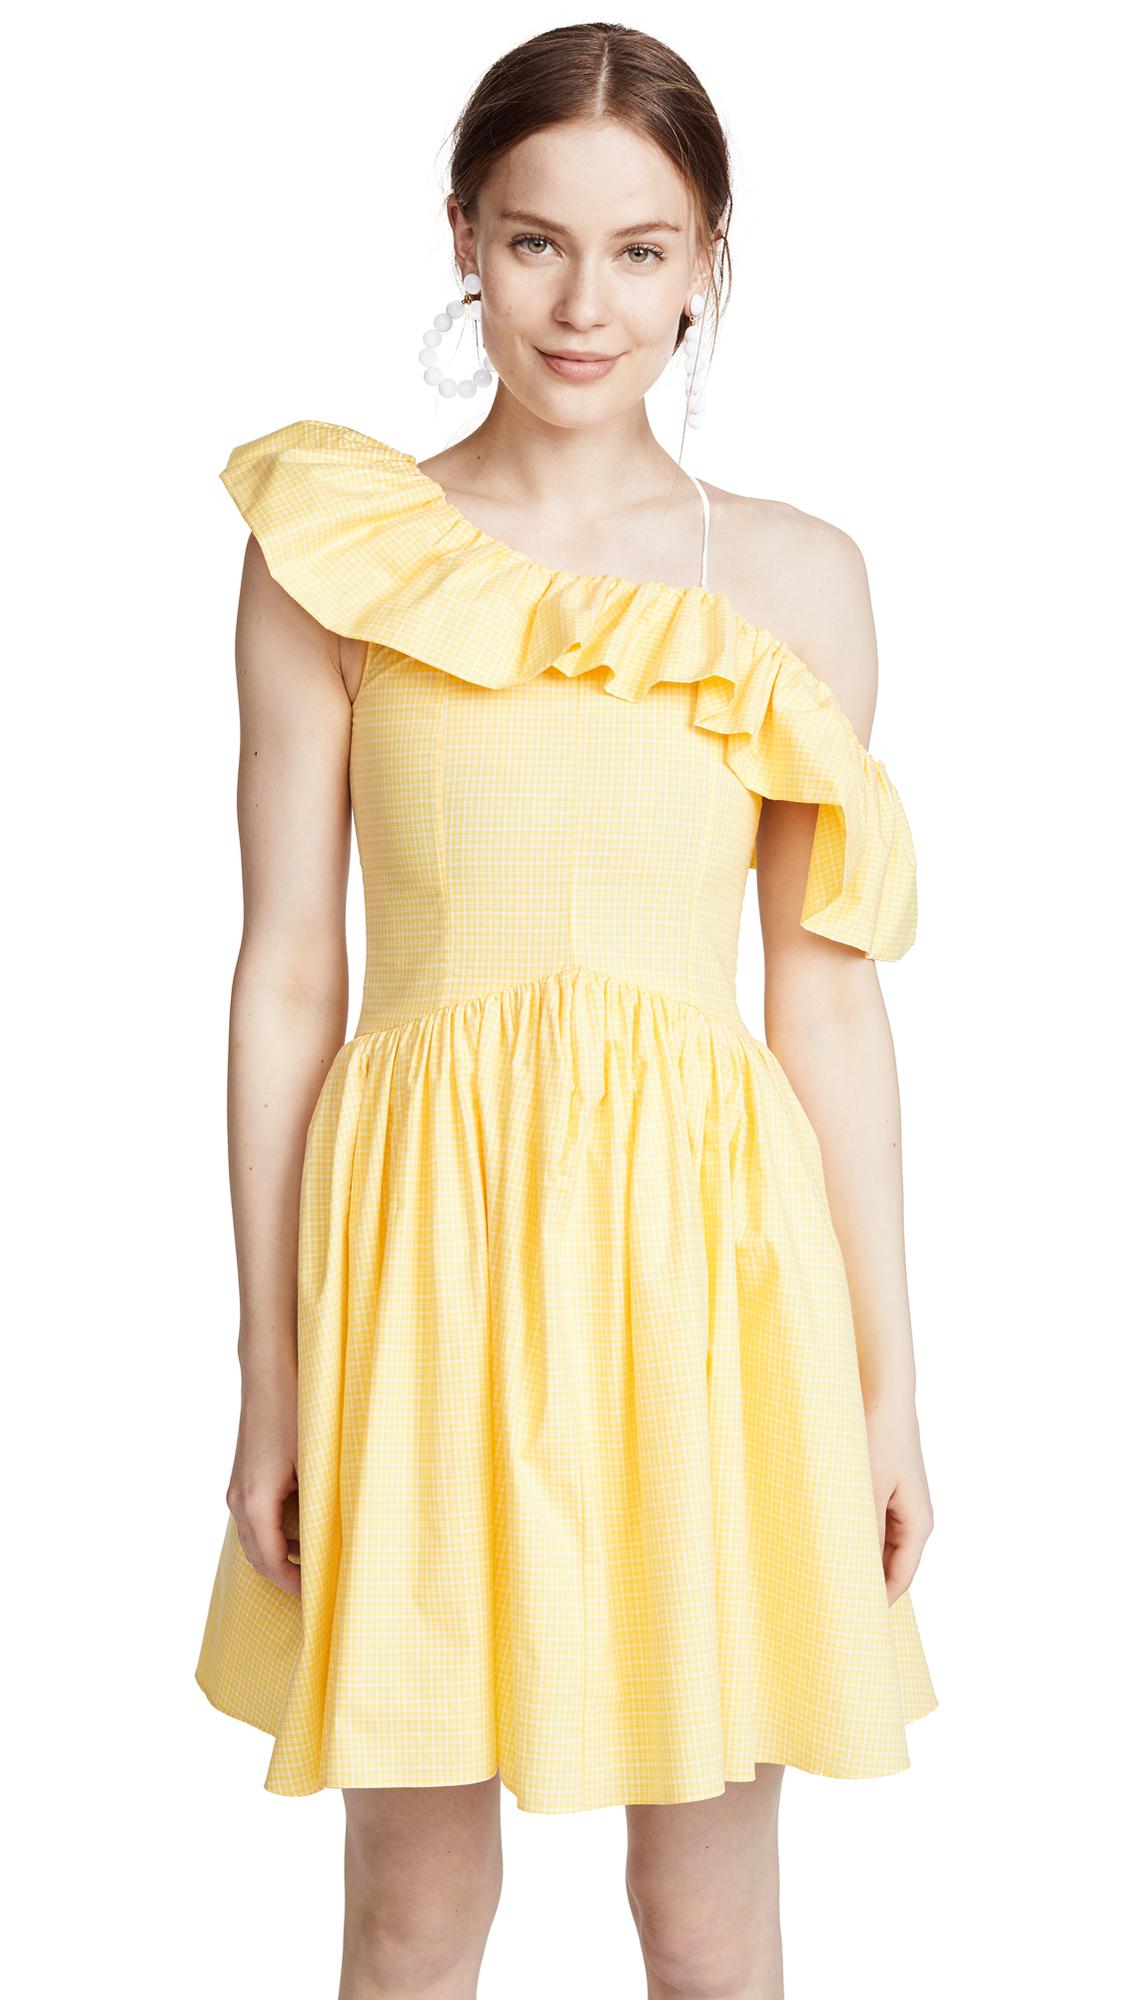 PAMPLEMOUSSE DAISY DRESS